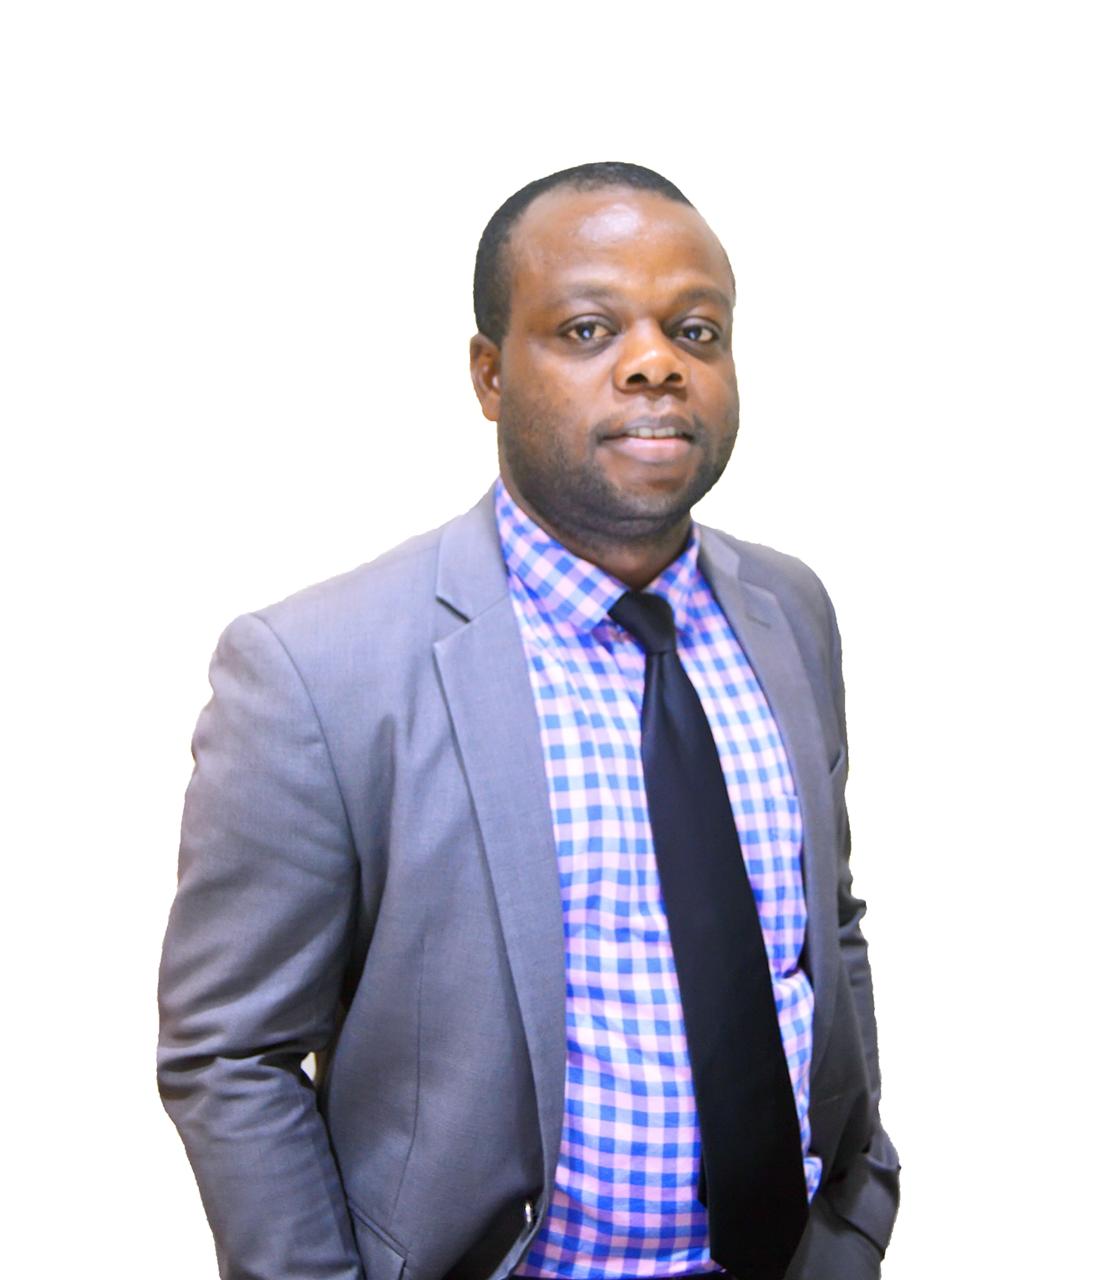 Dr. Jeremiah Bamidele